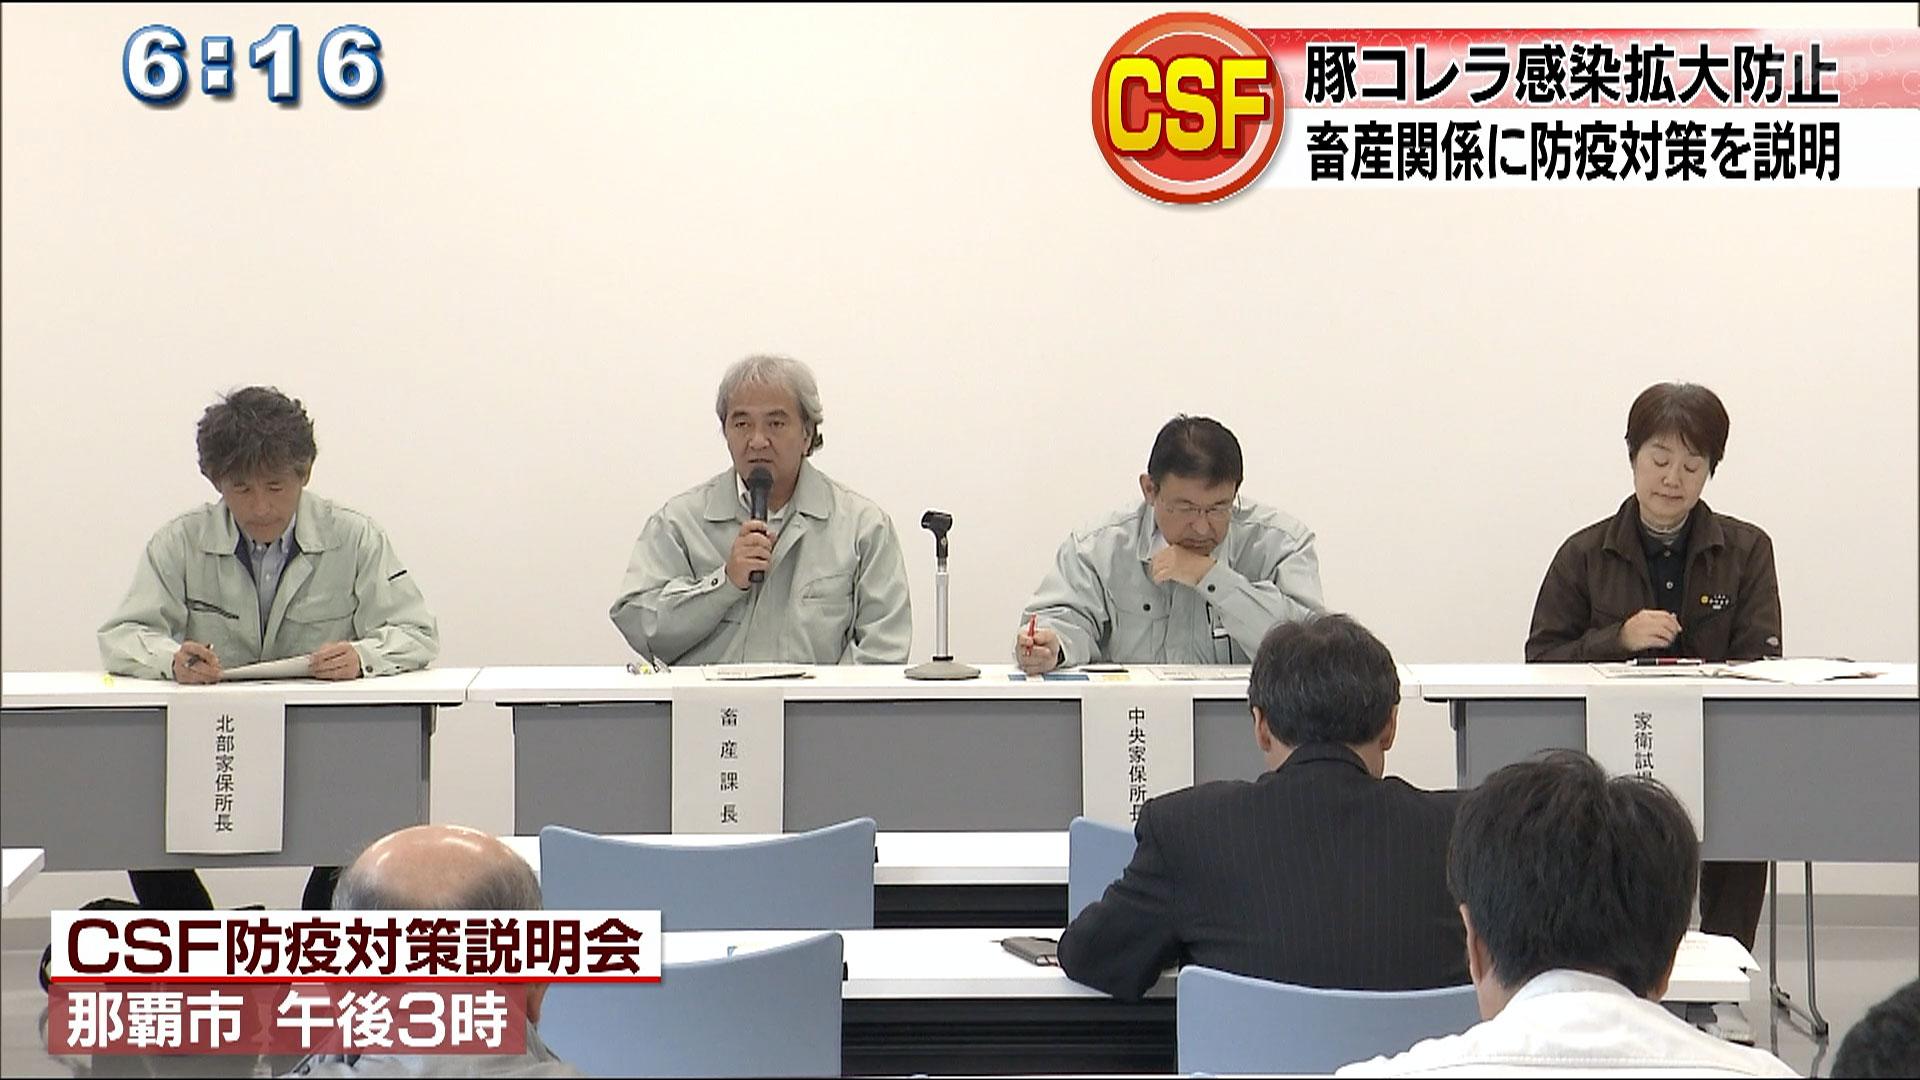 CSF防疫対策説明会